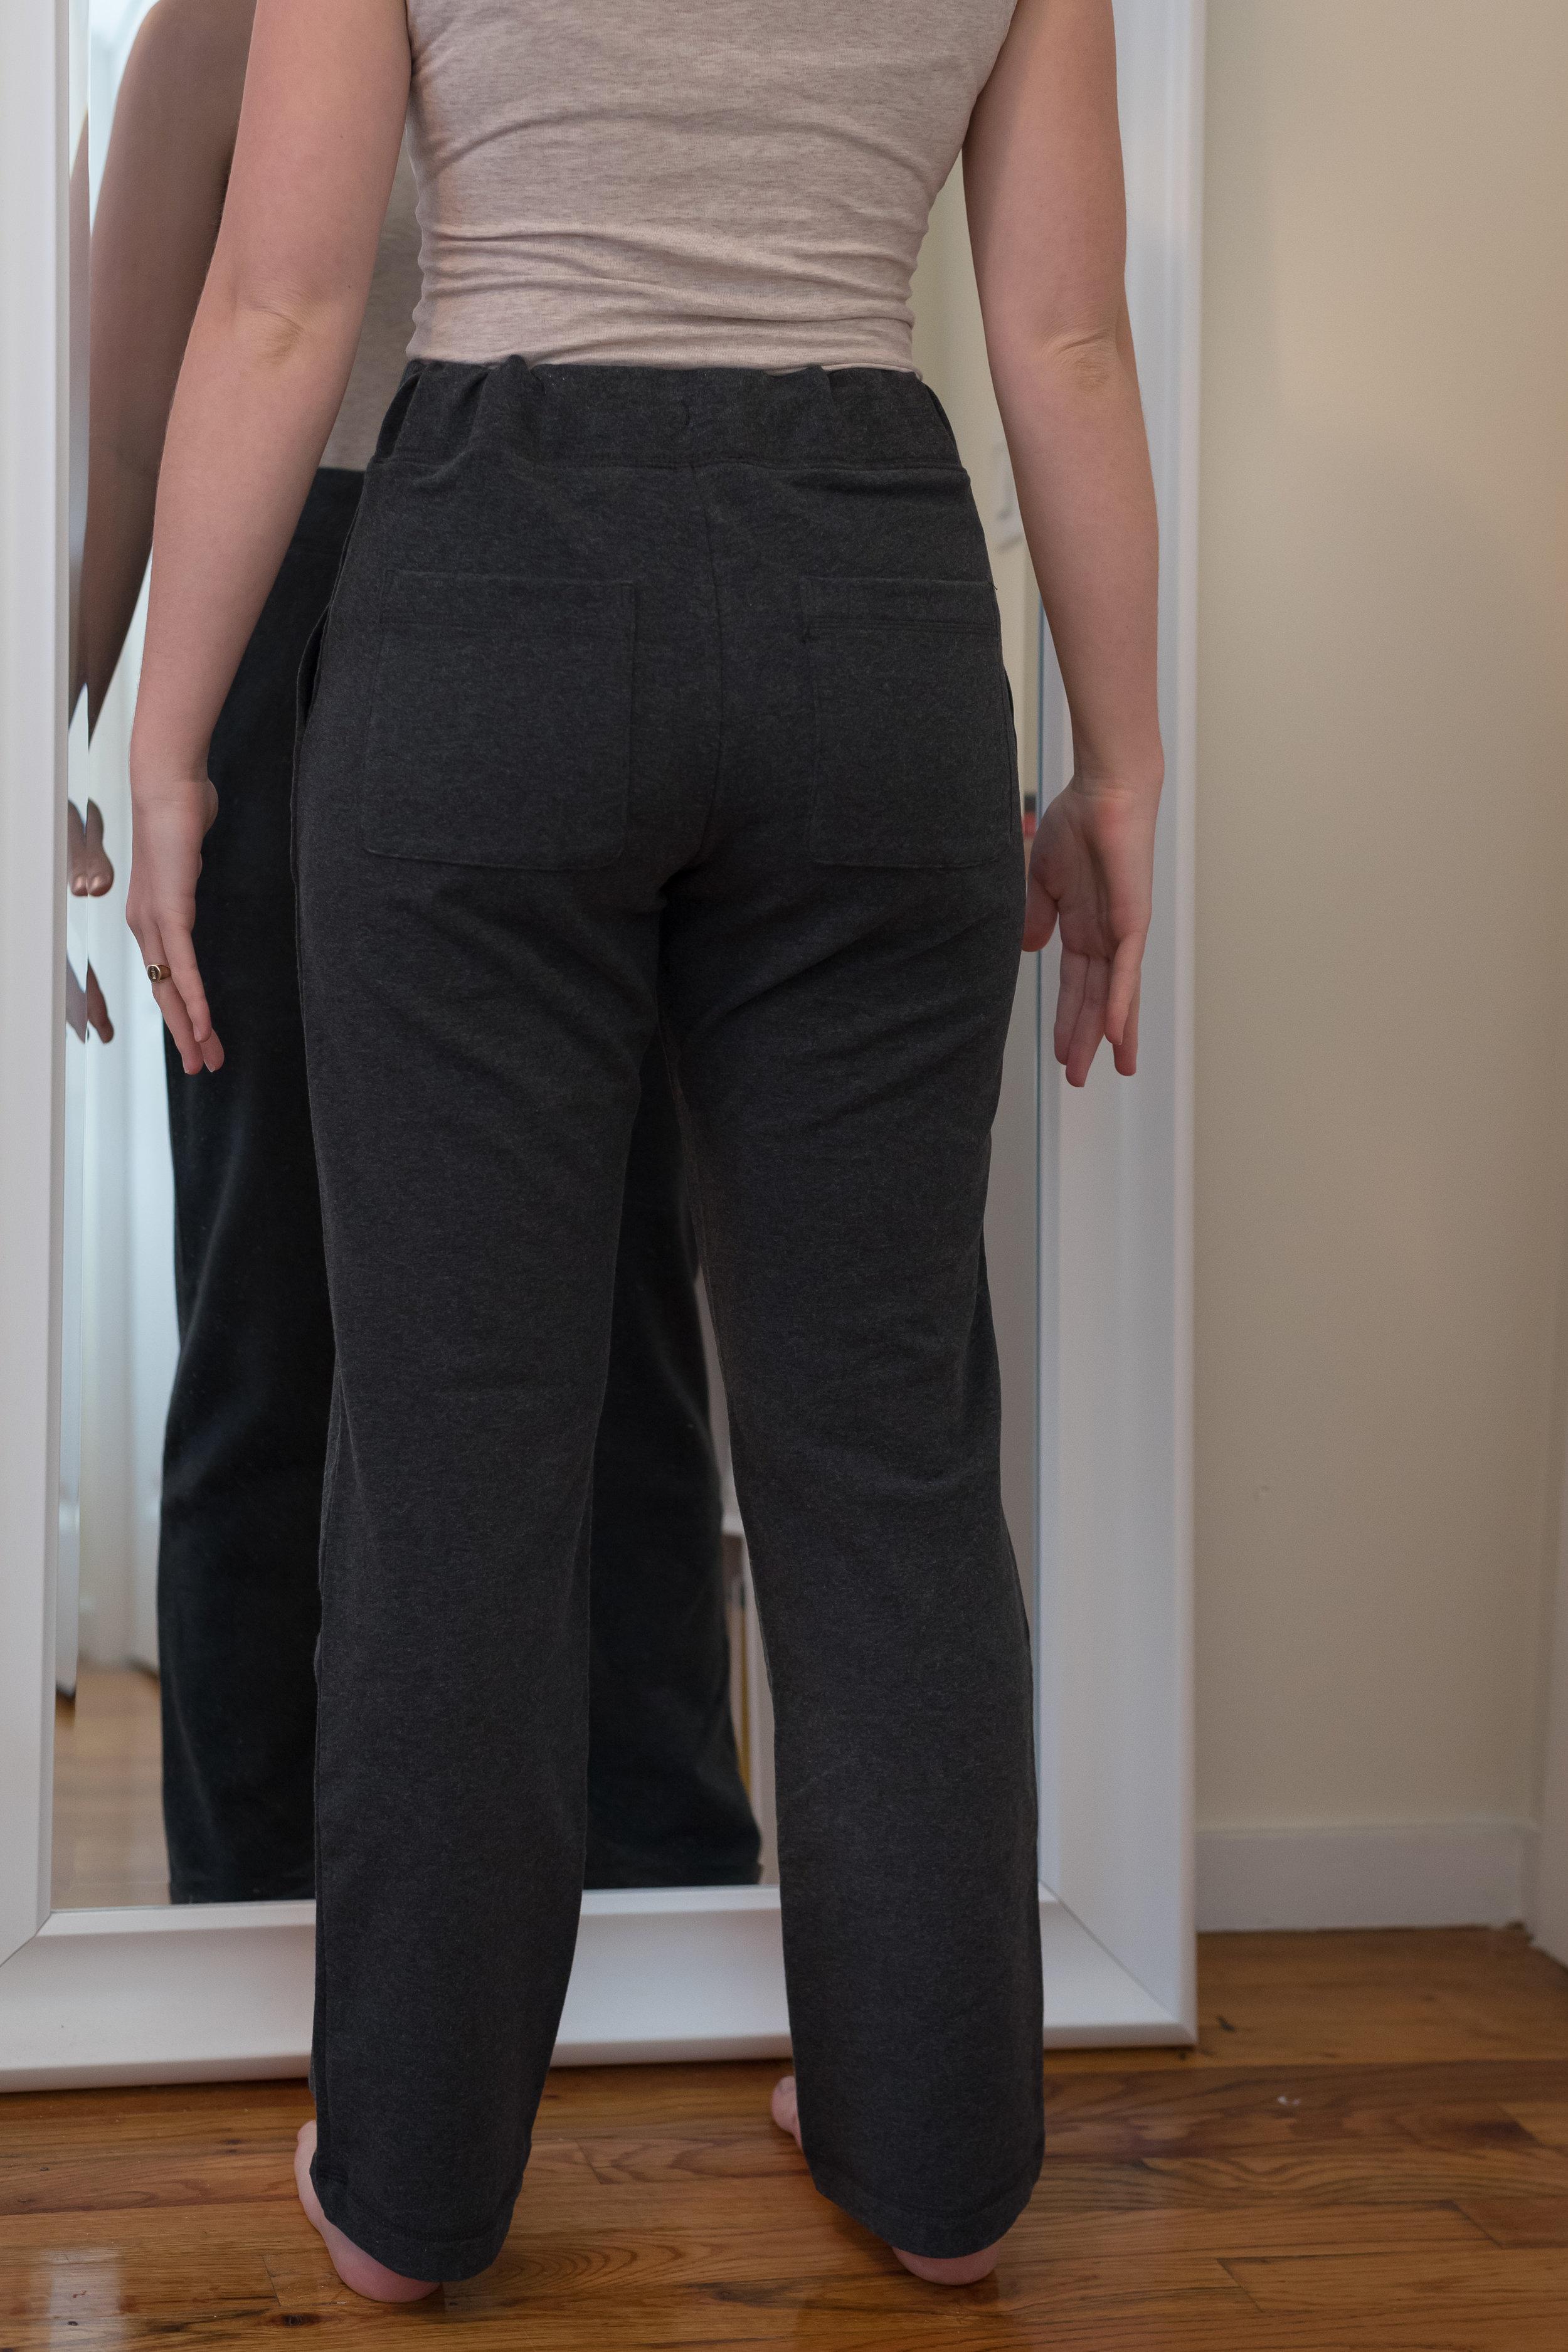 L.L. Bean Ultrasoft Sweats Straight Leg Petite - Size S Petite - Back View